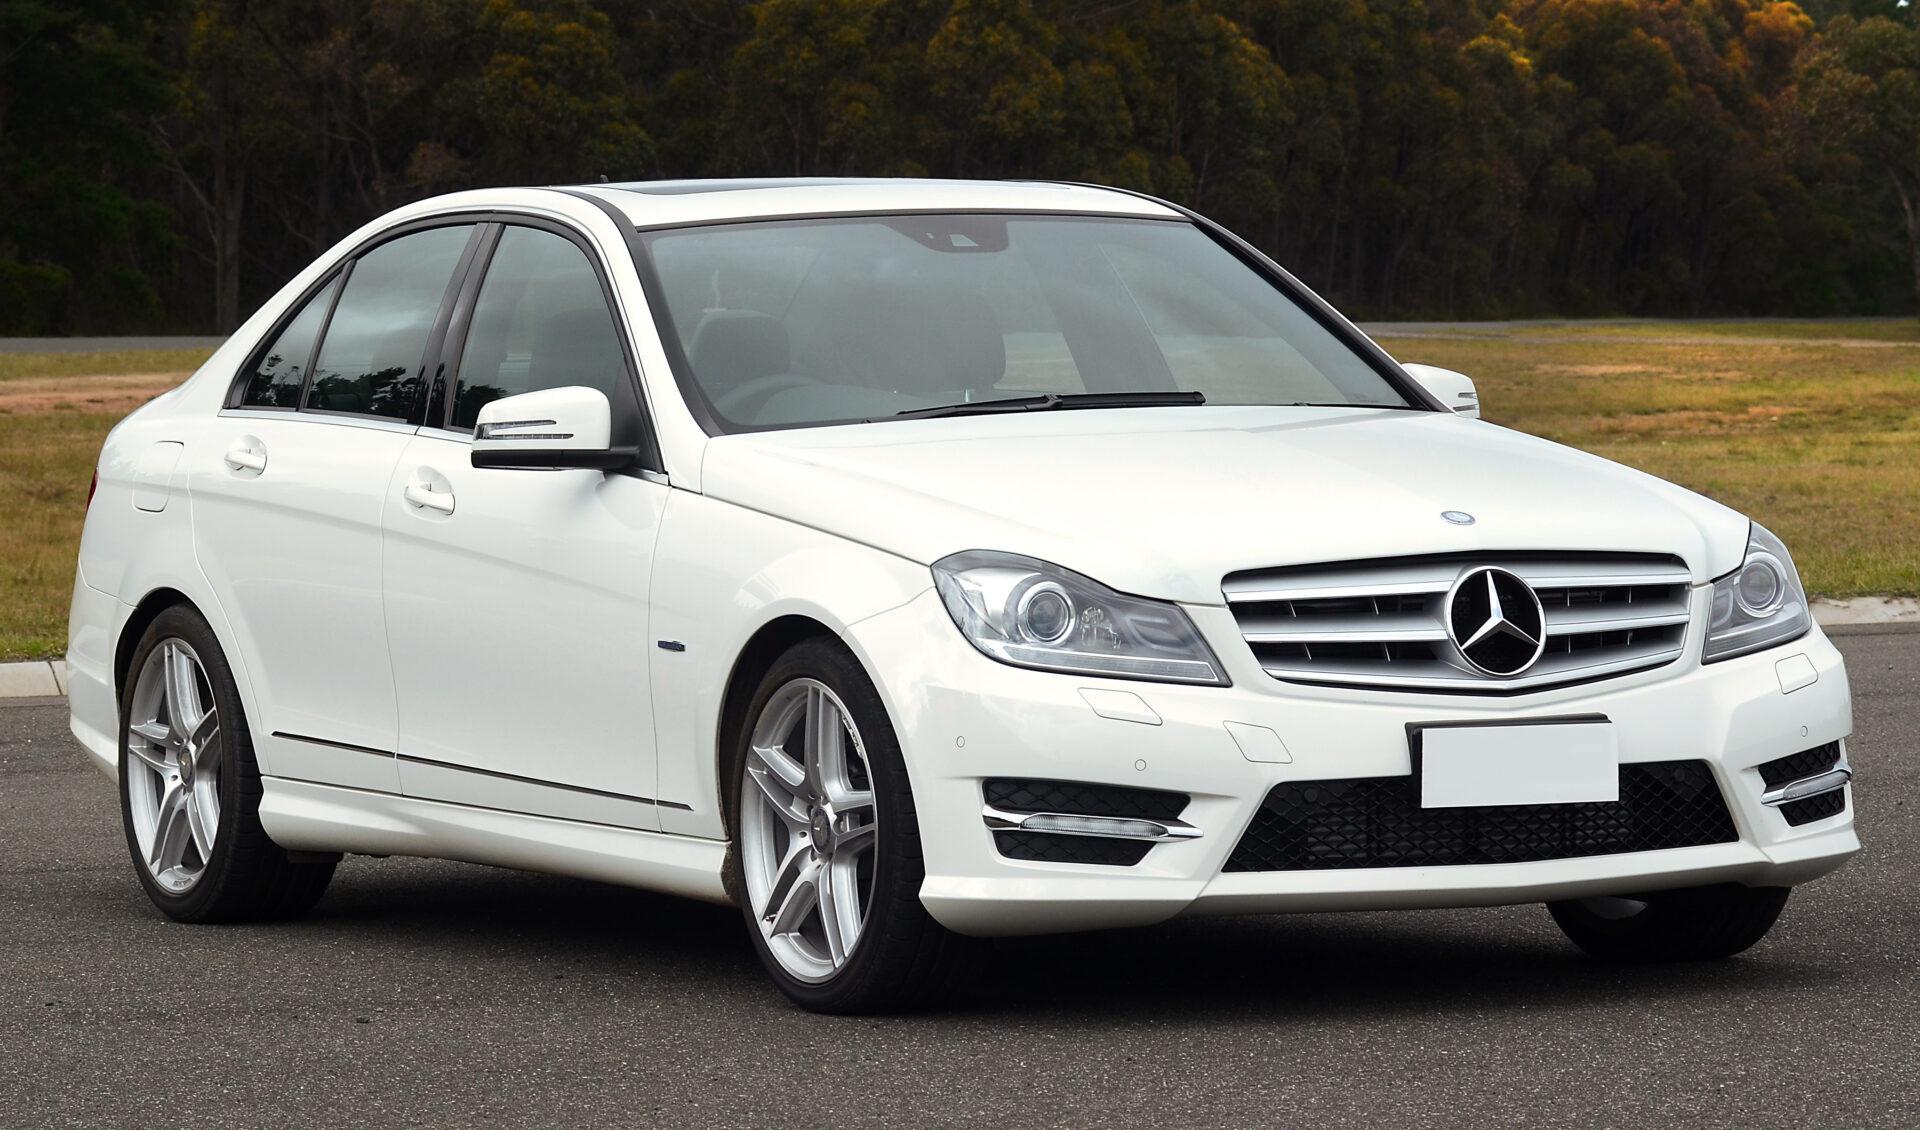 2011_Mercedes-Benz_C_250_CDI_(W204)_BlueEFFICIENCY_Avantgarde_sedan_(2011-10-11)